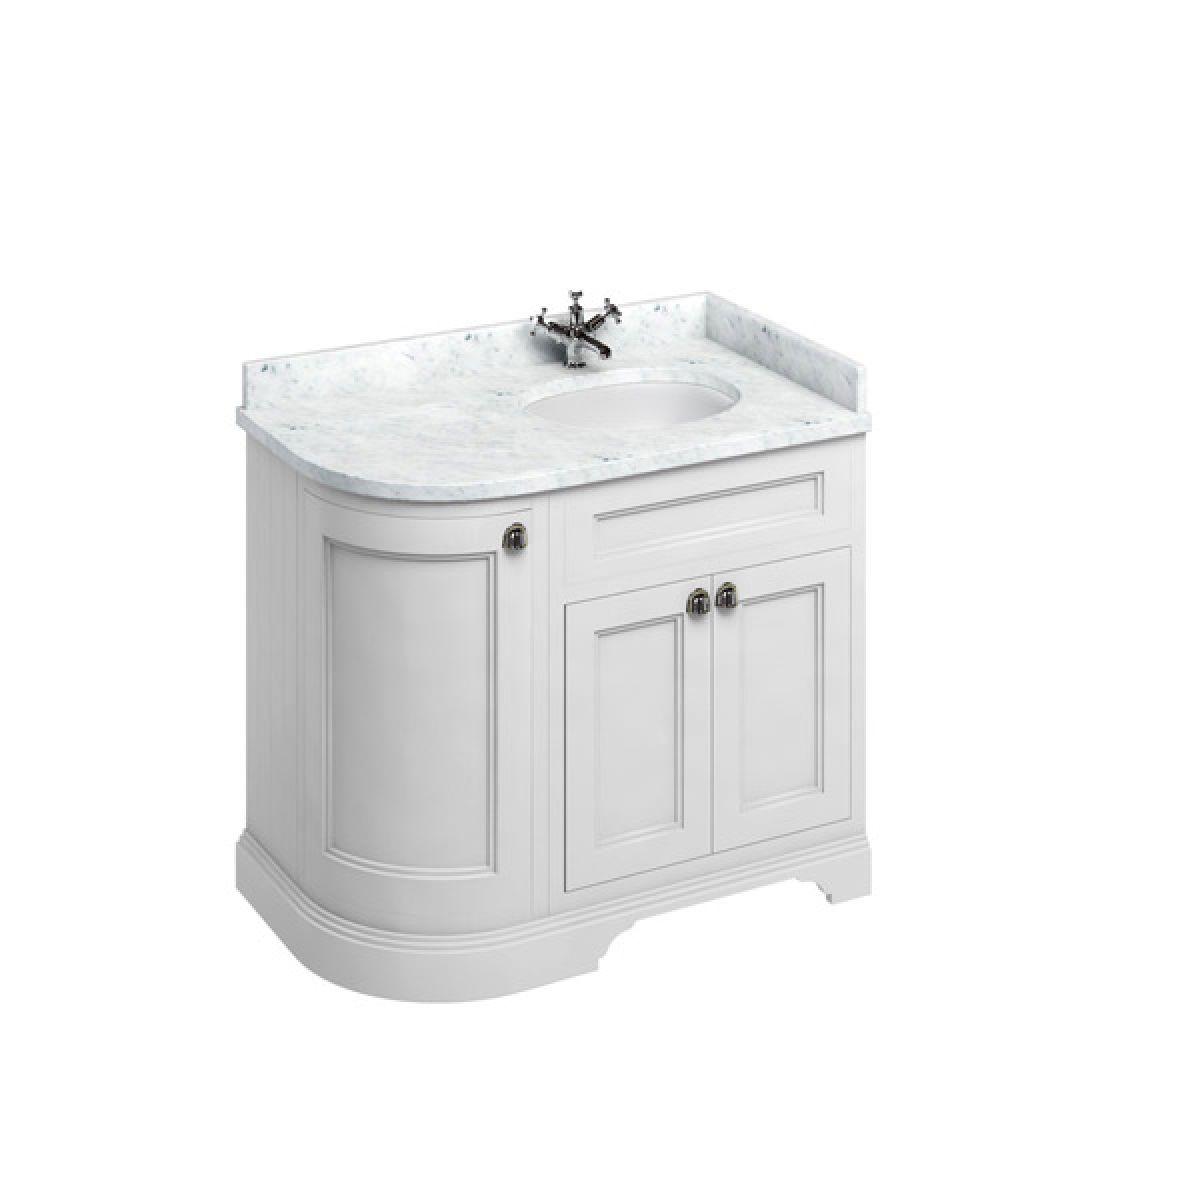 Burlington Matt White Freestanding Right End Round Vanity Unit 980mm Carrara White